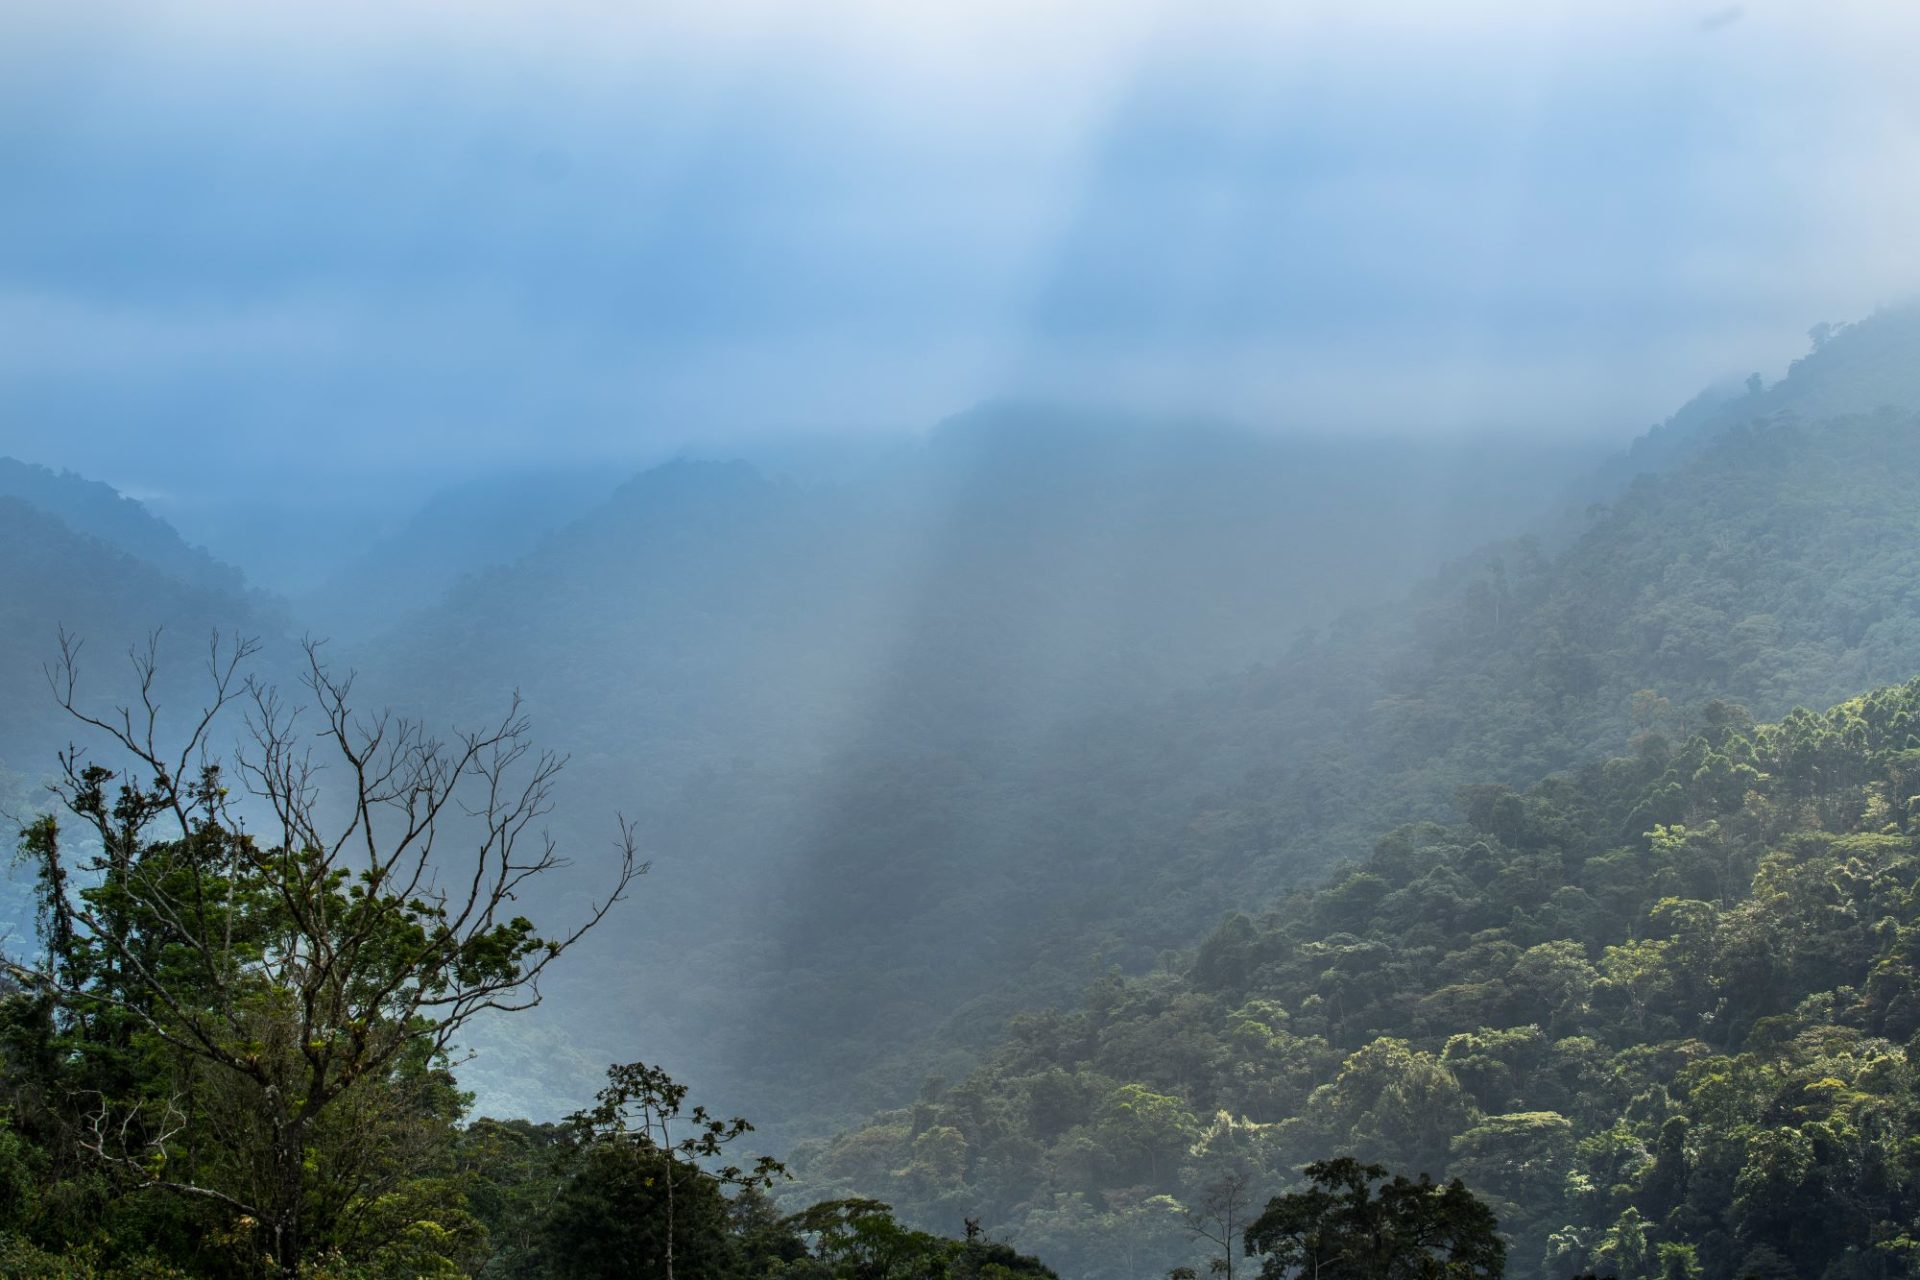 wp-content/uploads/itineraries/Costa-Rica/Day1OTGlandscape.jpg